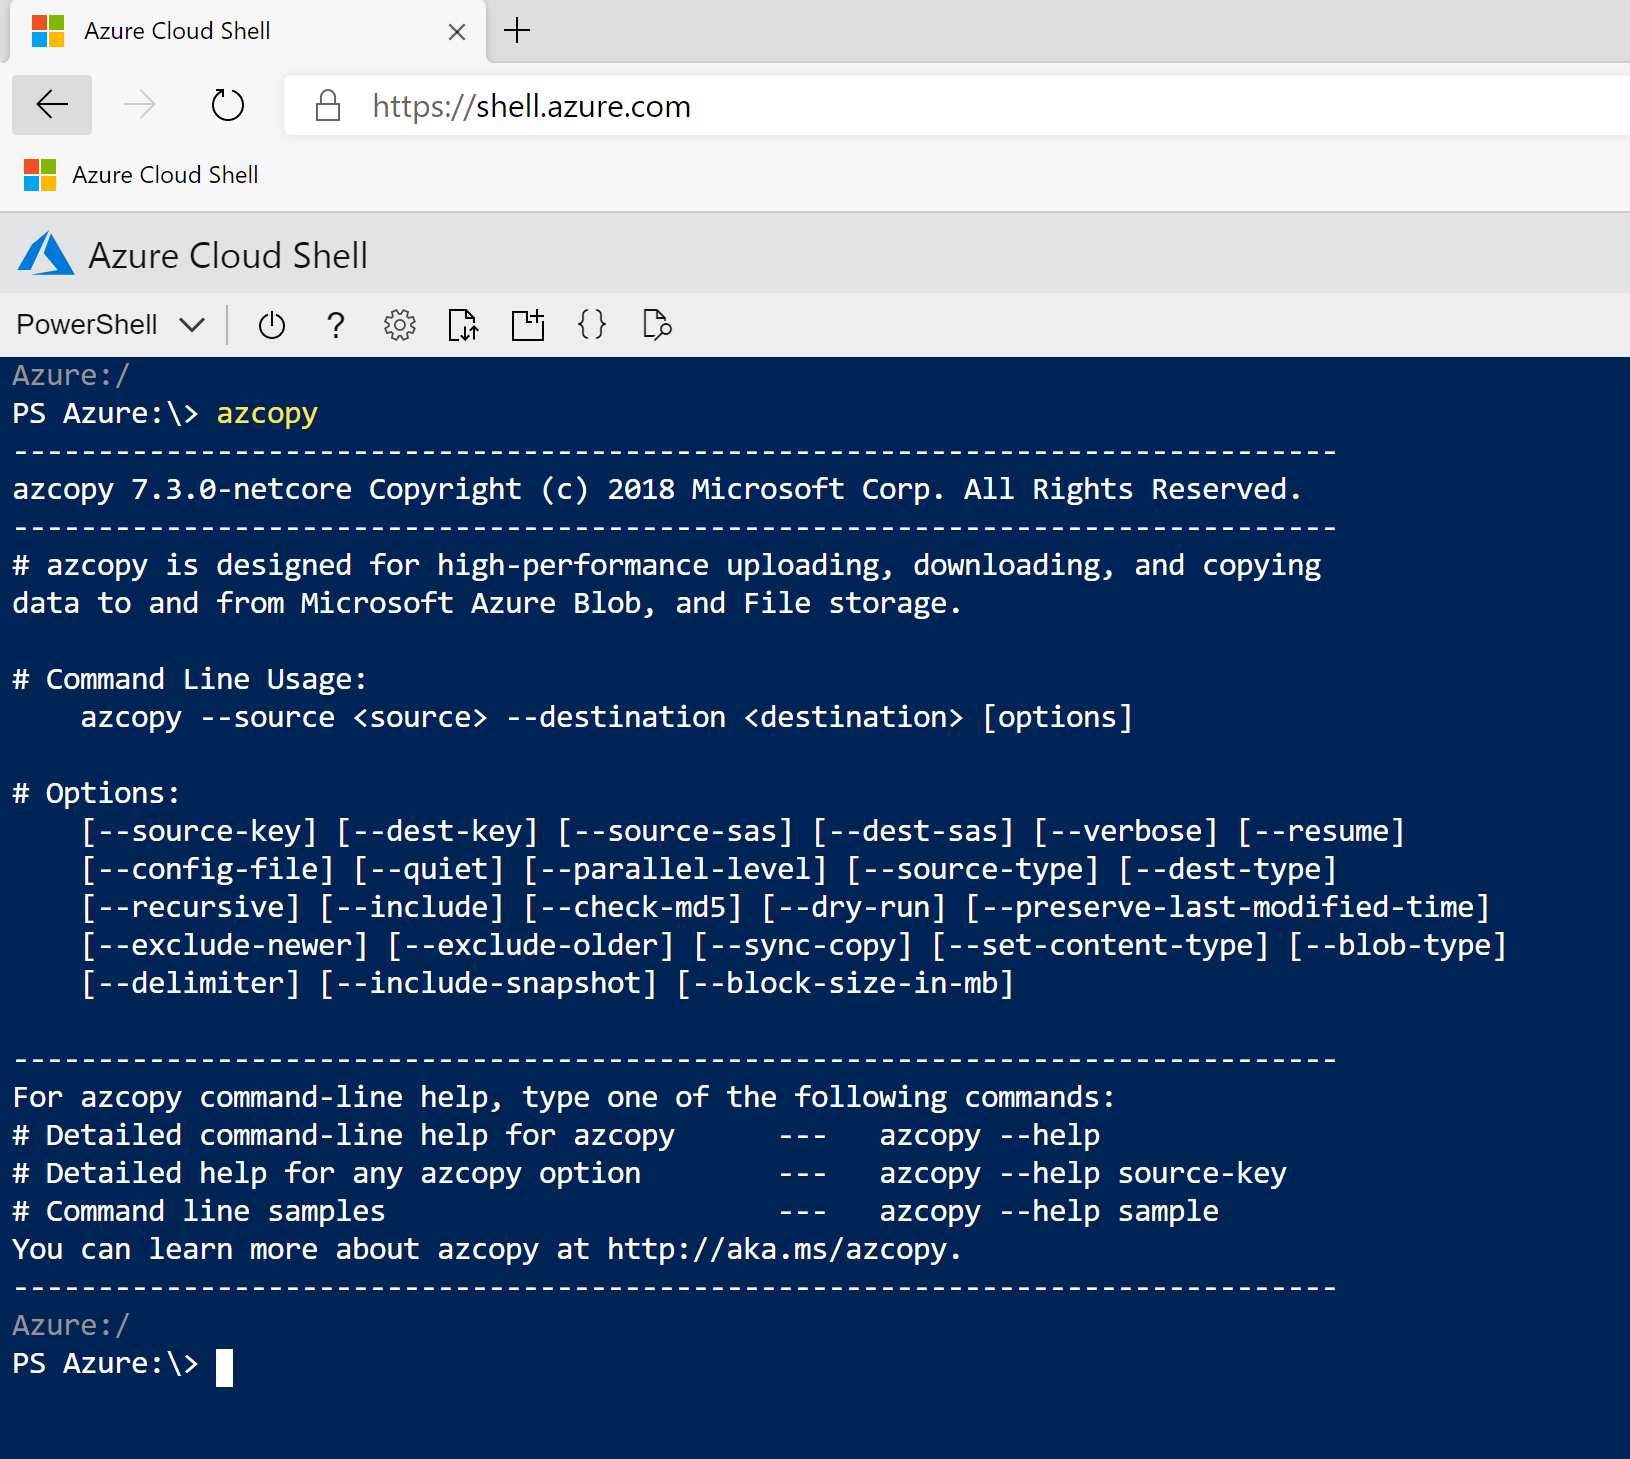 Microsoft Azure CloudShell for Management tasks - Microsoft